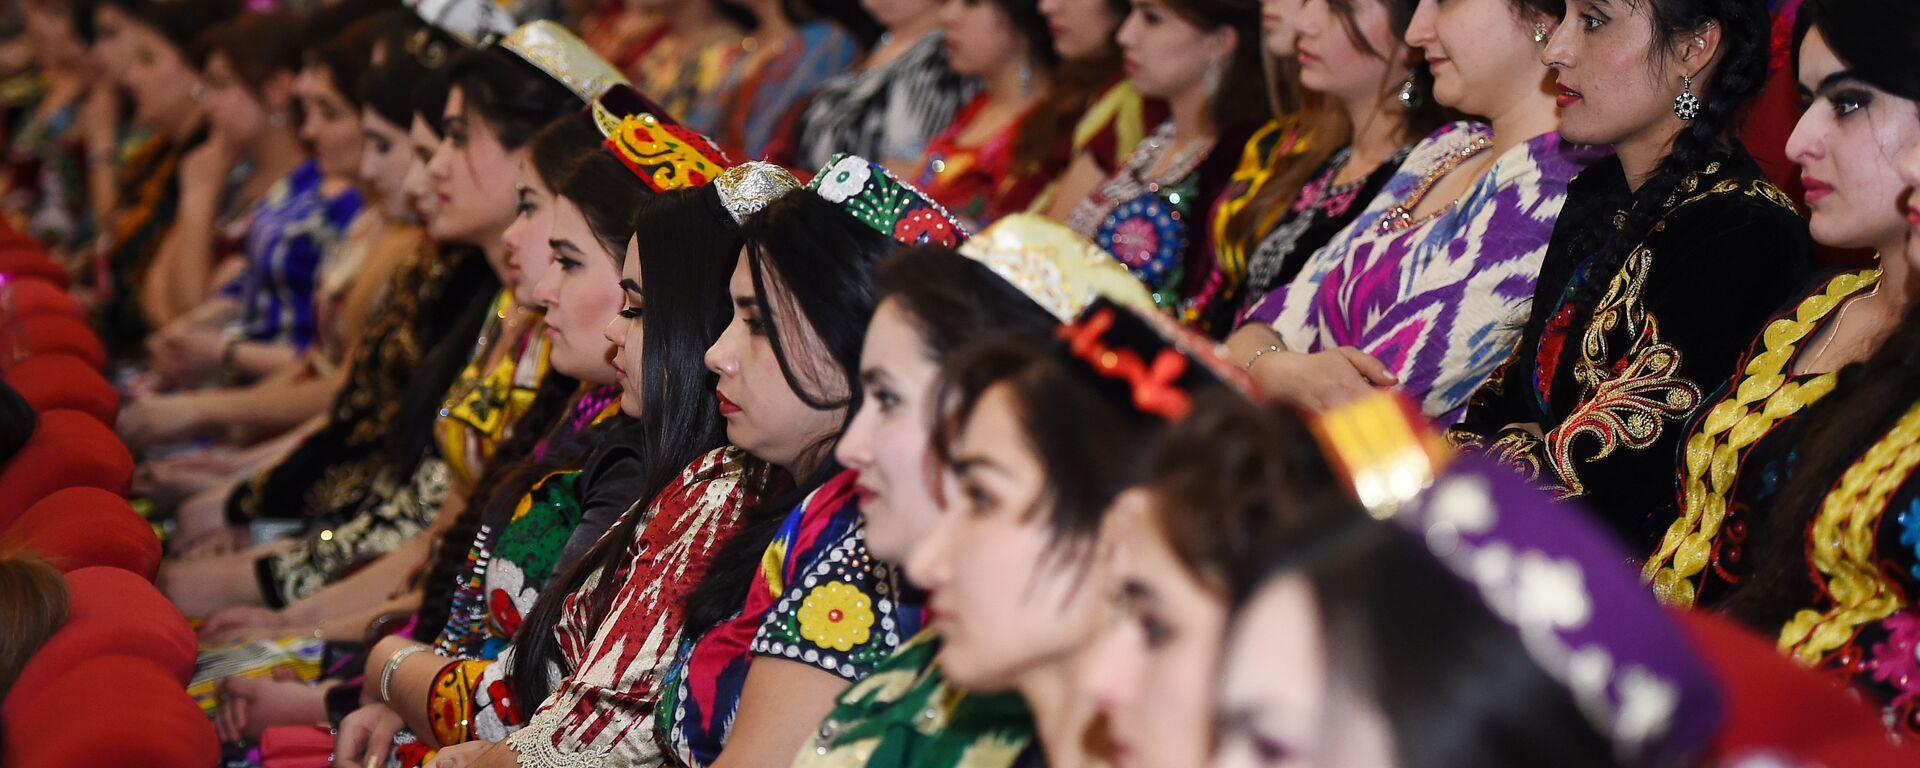 Женщины Таджикистана - Sputnik Тоҷикистон, 1920, 26.09.2019